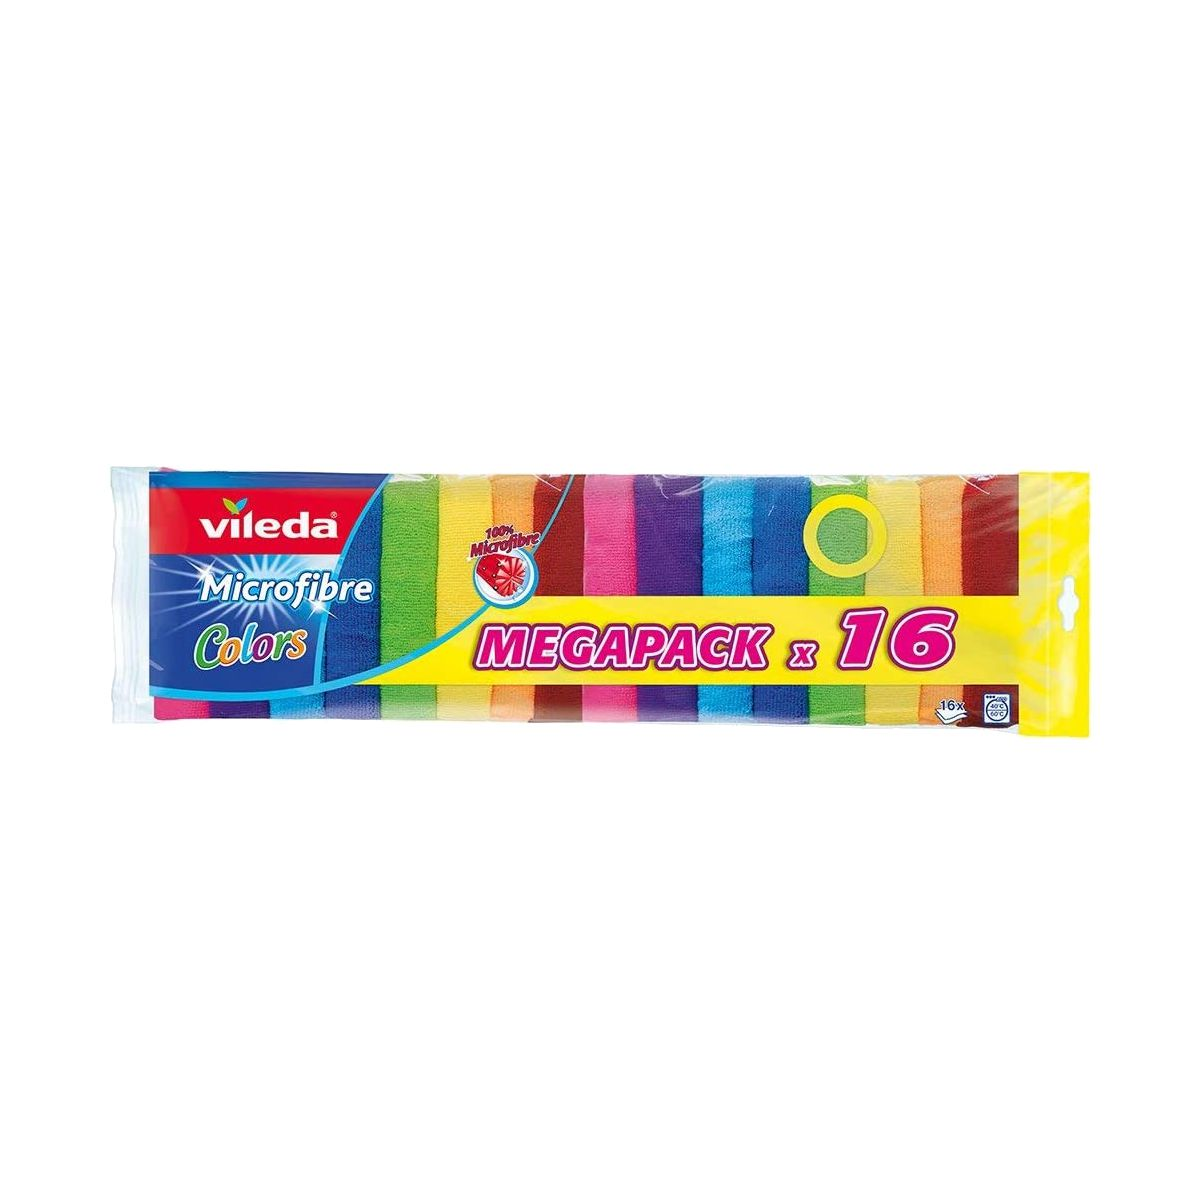 Pano microfibras Vileda Colors 30x30cm (pack 16)